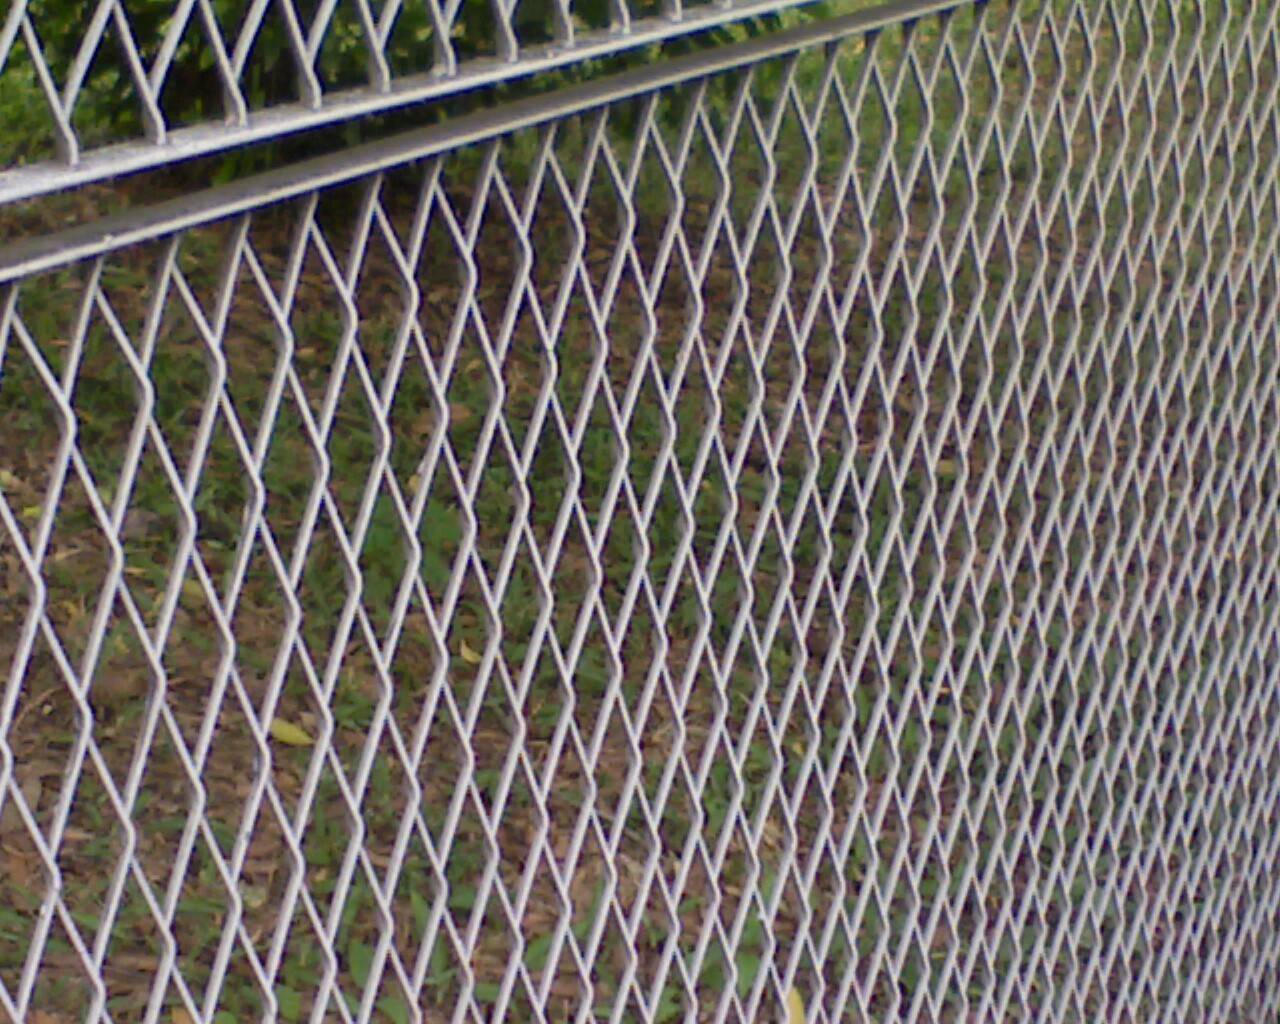 Mesh netting fencing bing images